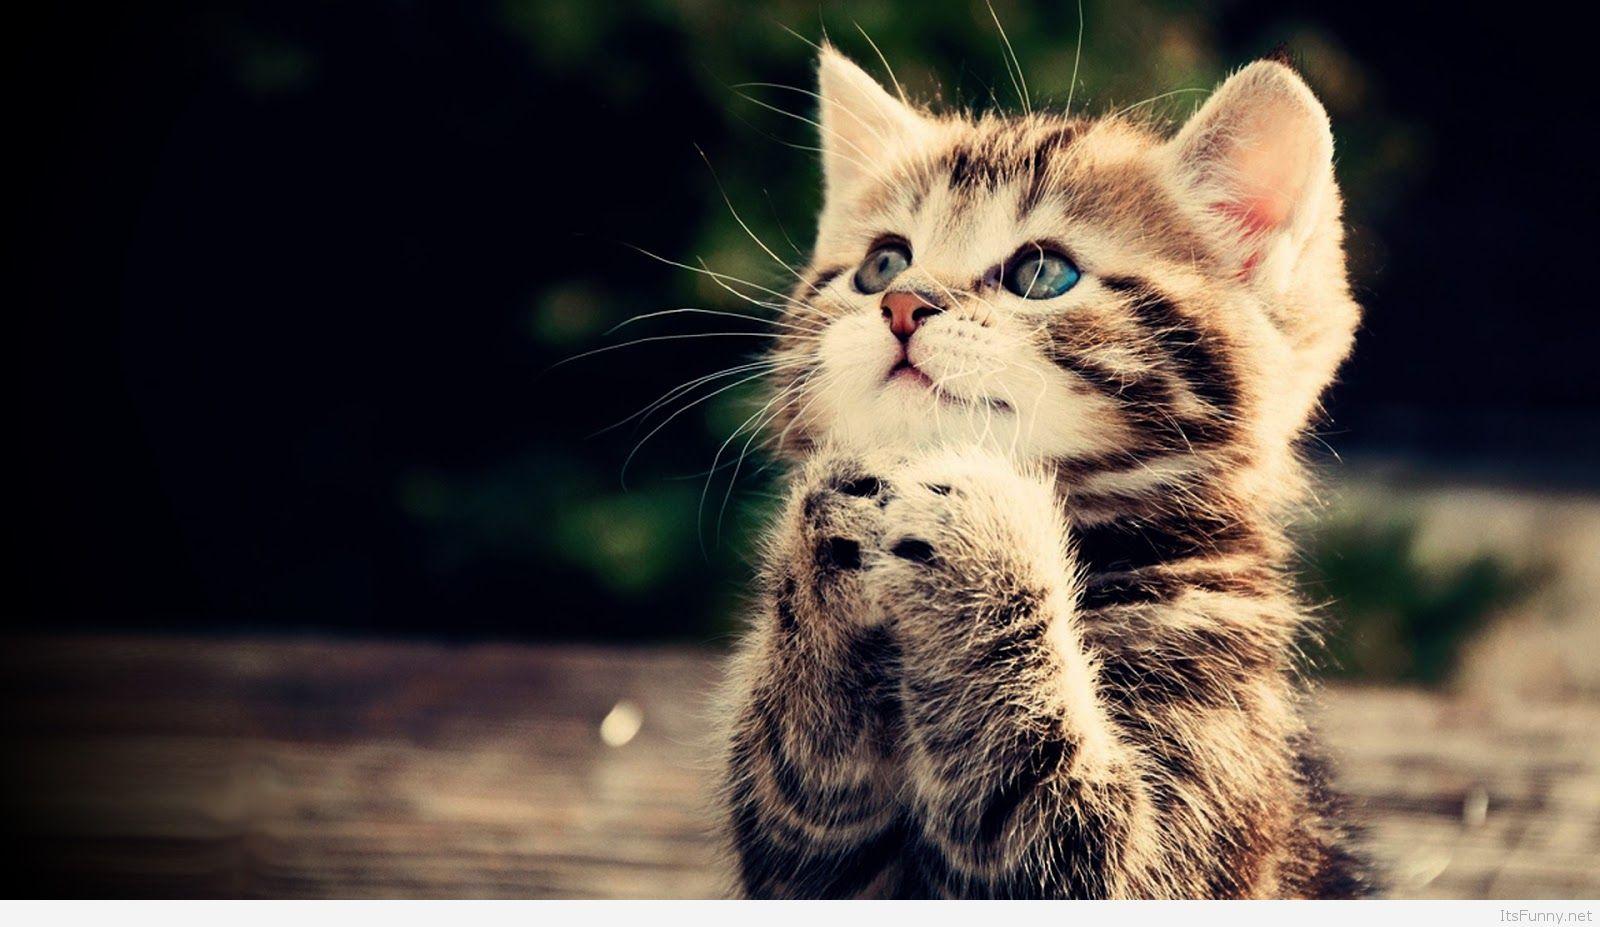 Funny Cat Full Hd Wallpaper Praying Kitten Cute - Fondos De Pantalla De Gatos Tiernos , HD Wallpaper & Backgrounds